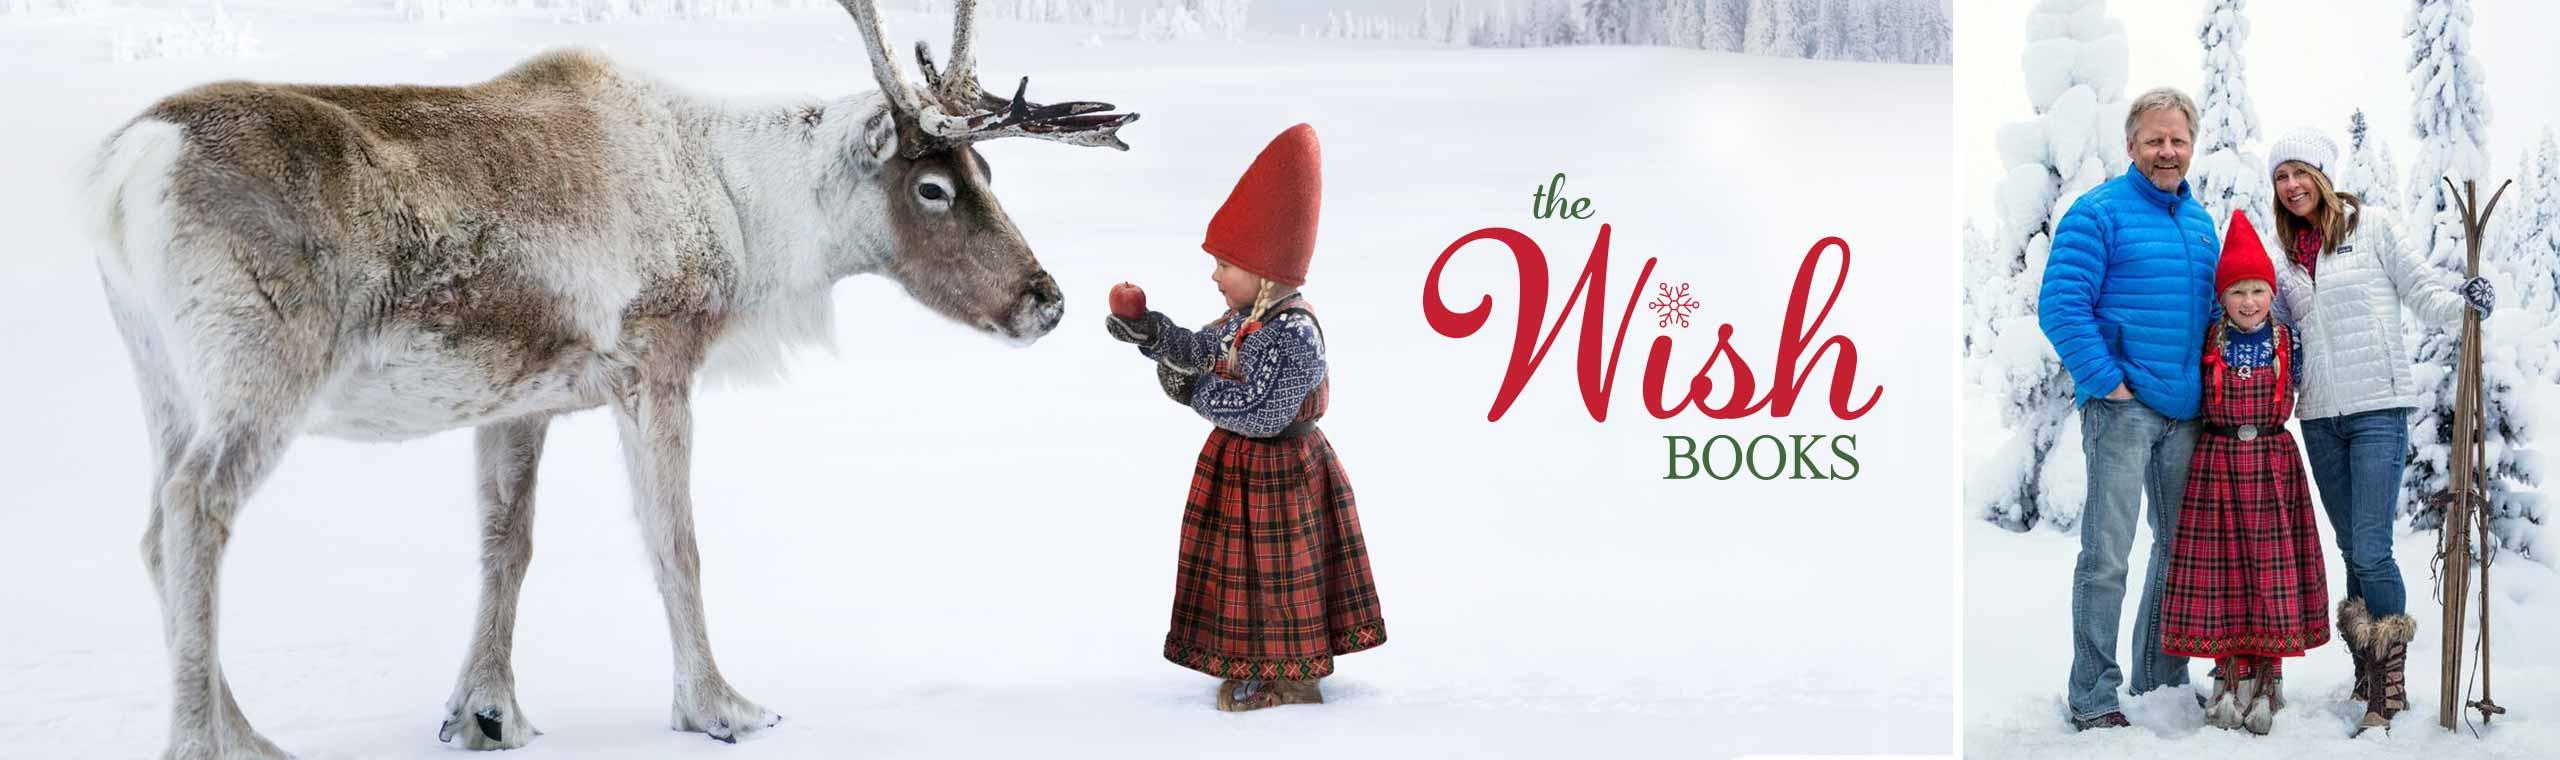 an elf feeding a raindeer. and the logo of the Wish books